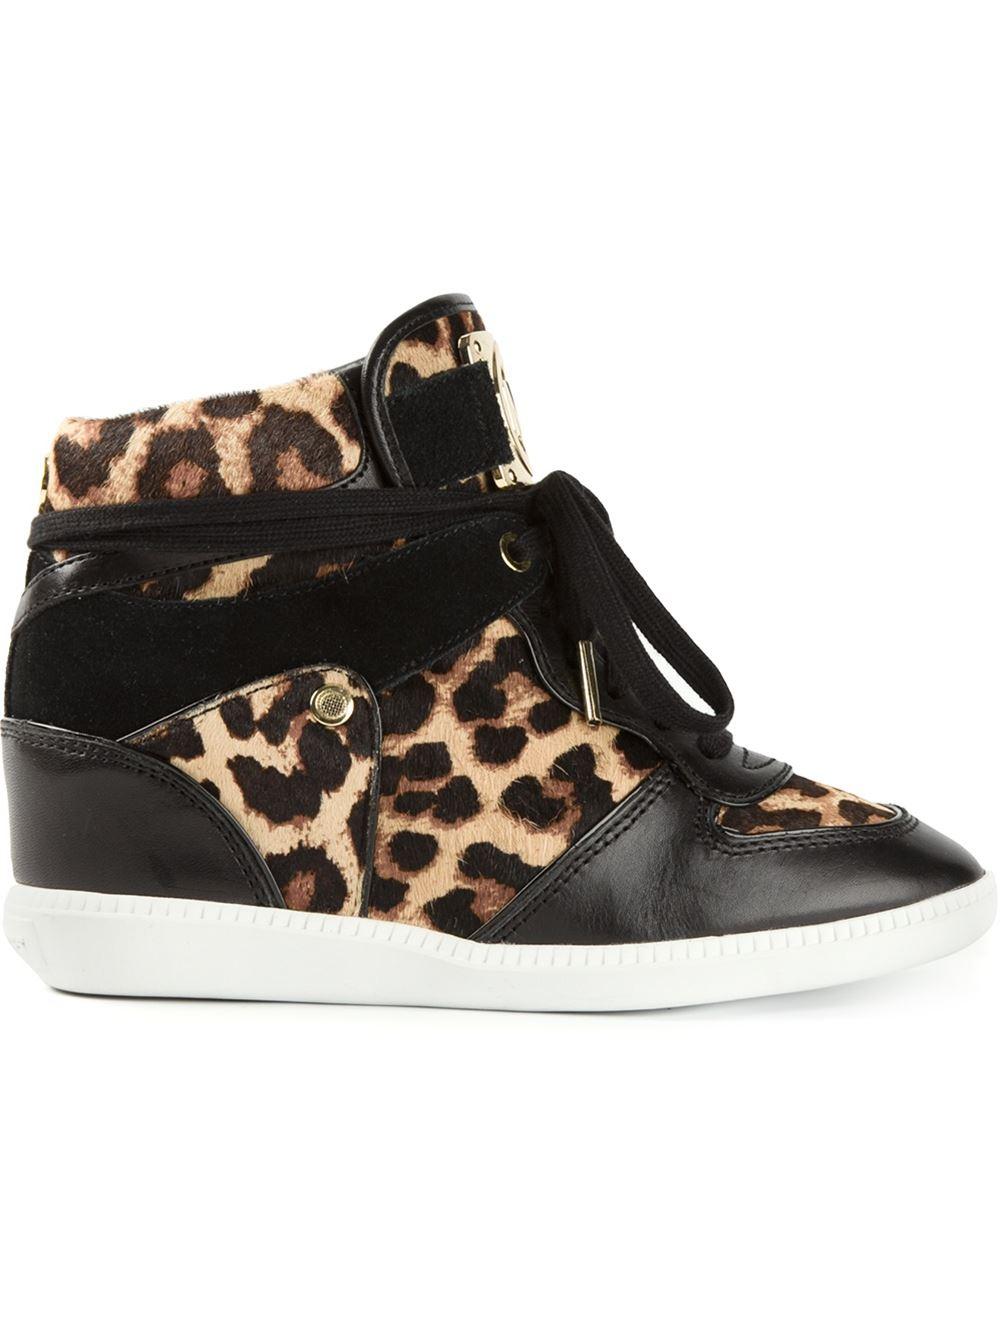 michael kors sneakers leopard print